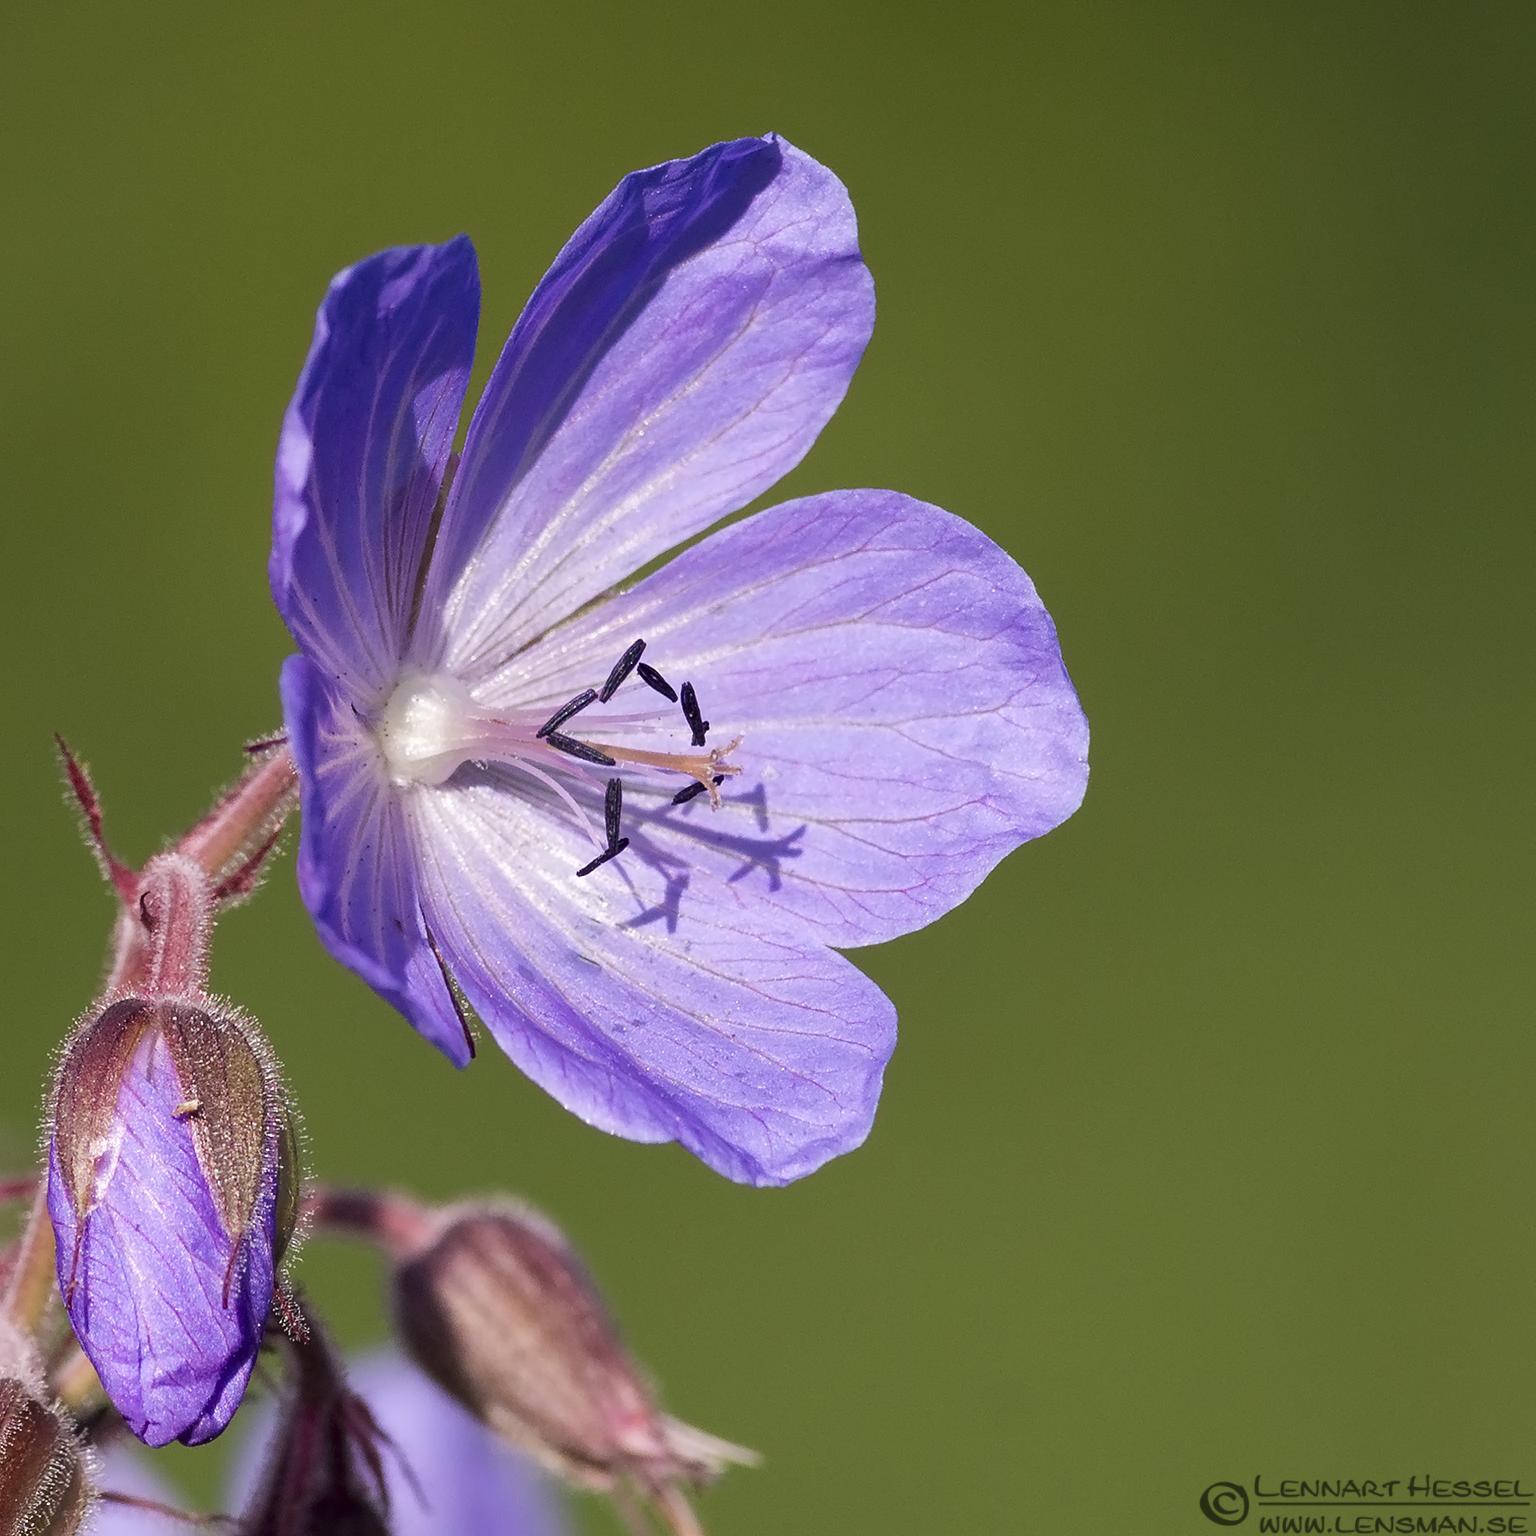 Flower visit West Gotland